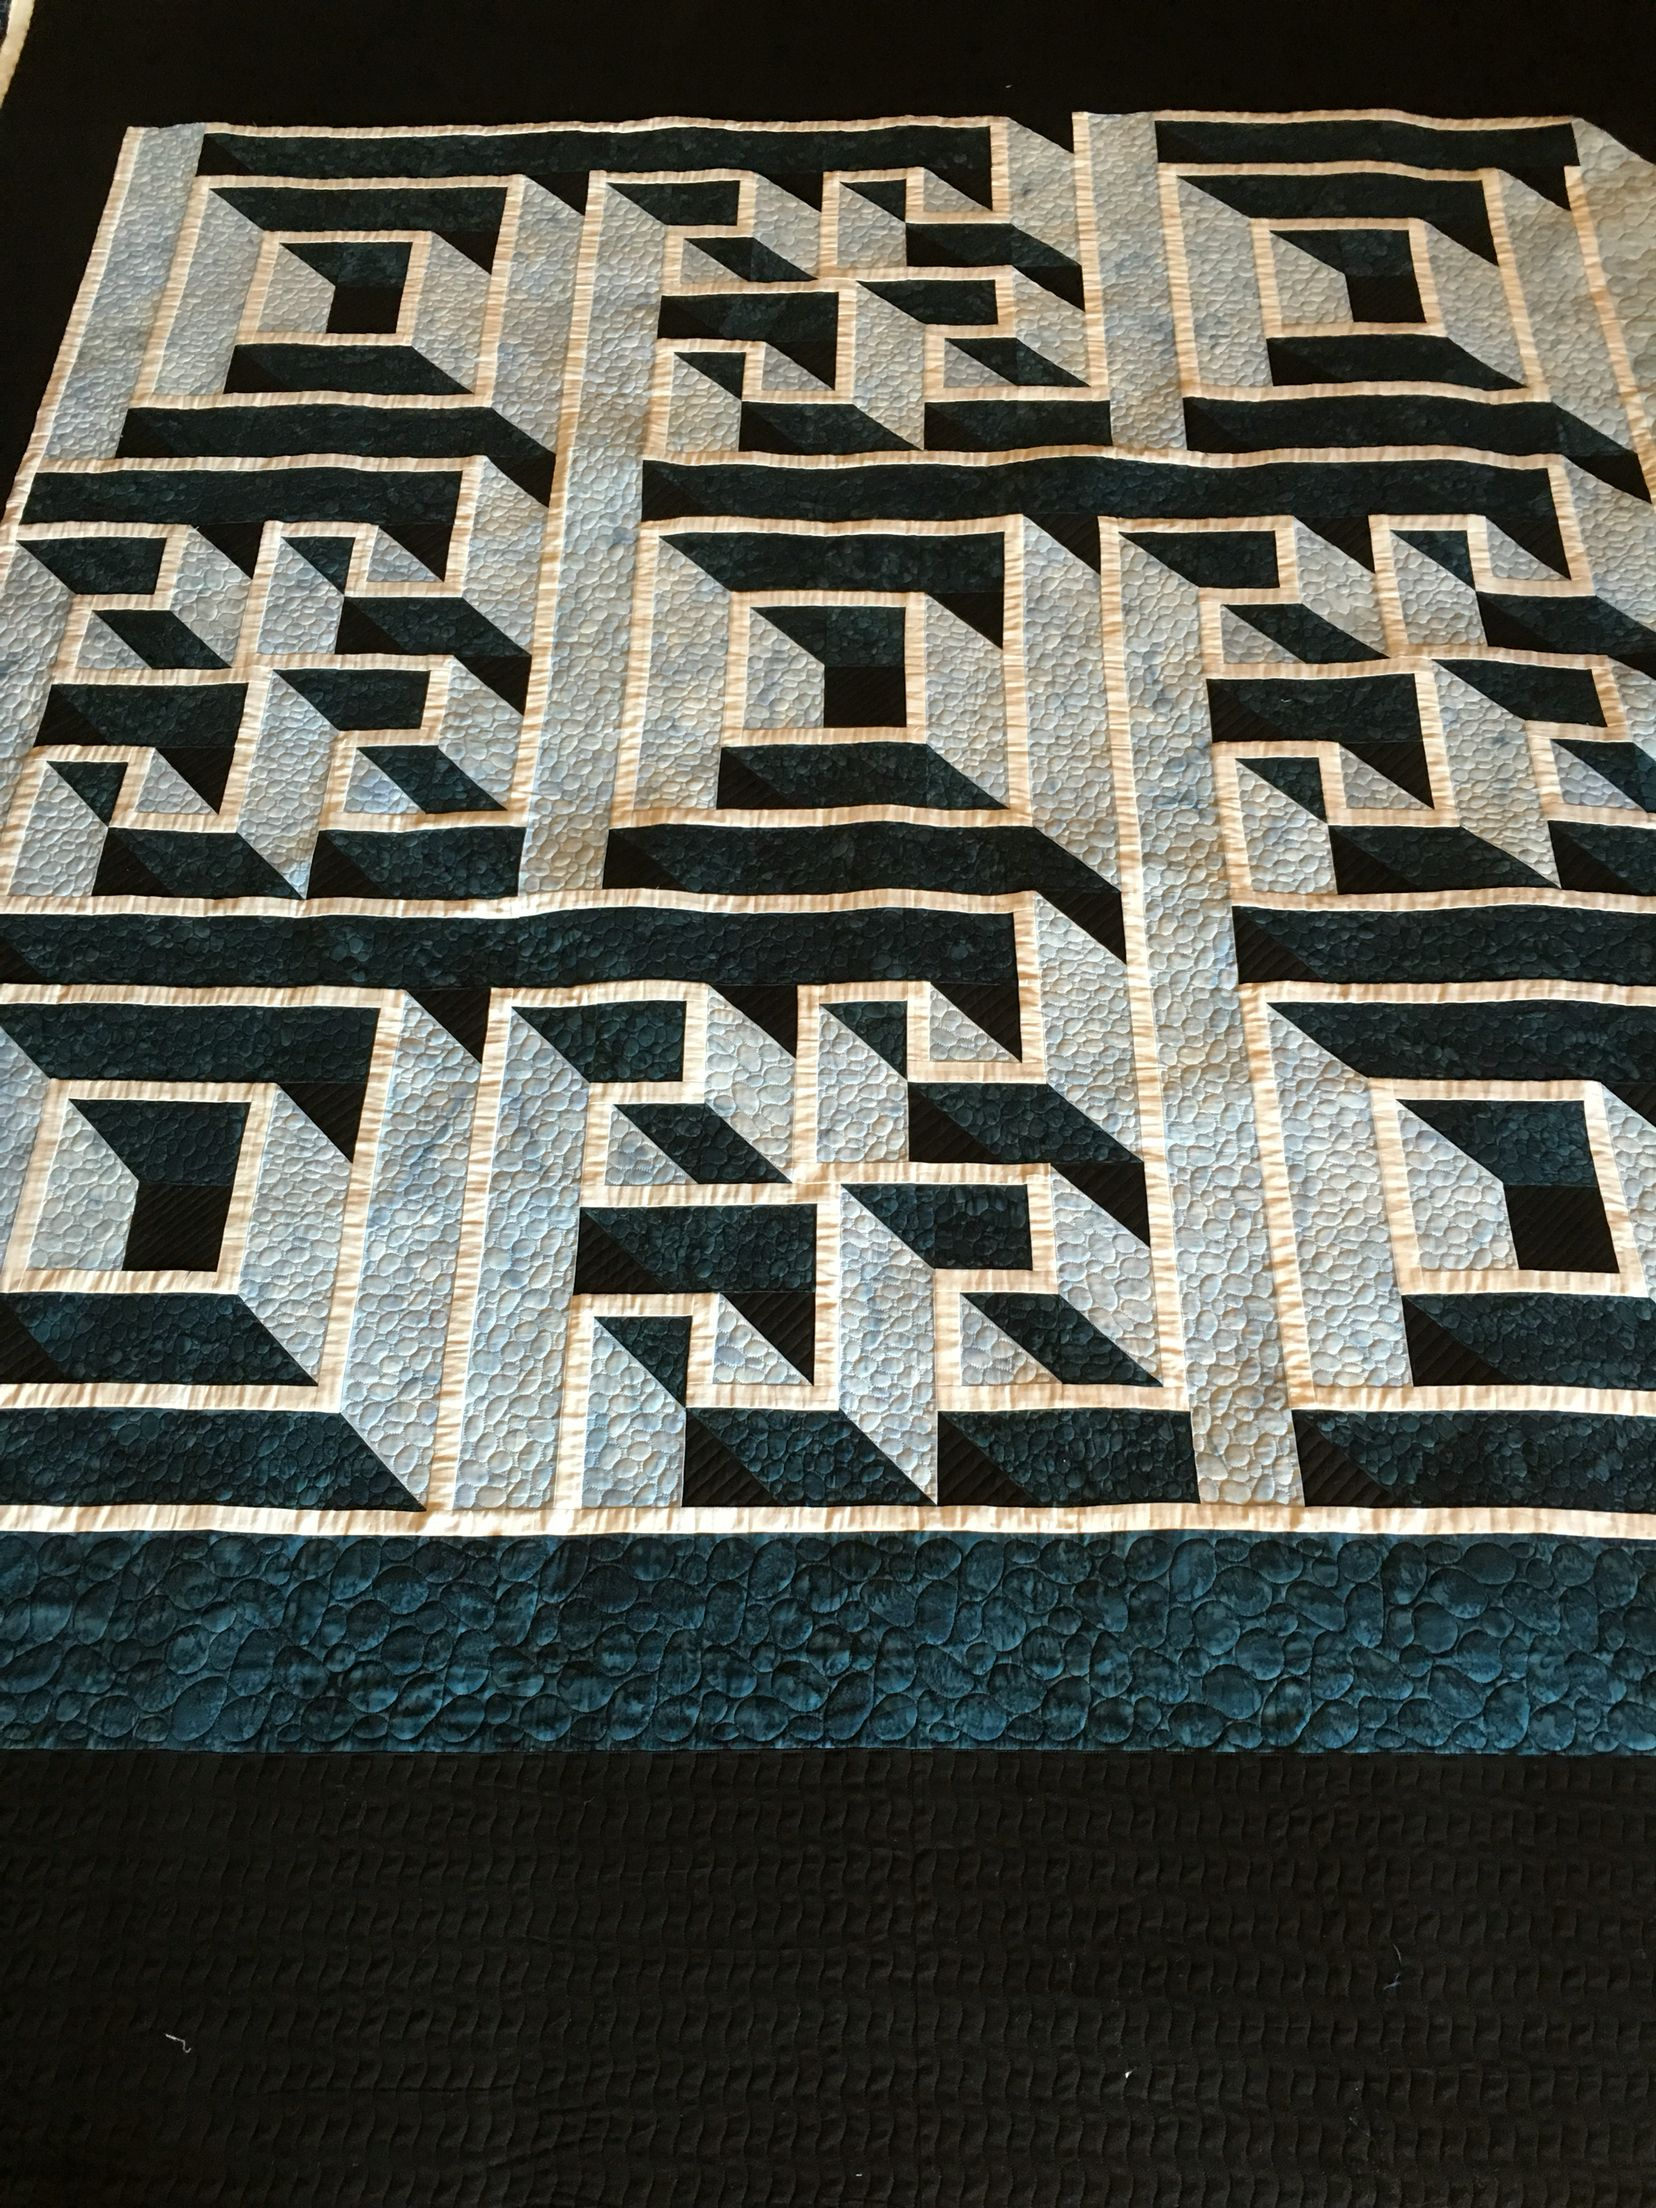 Labyrinth Walk Quilts Labyrinth Walk Quilts